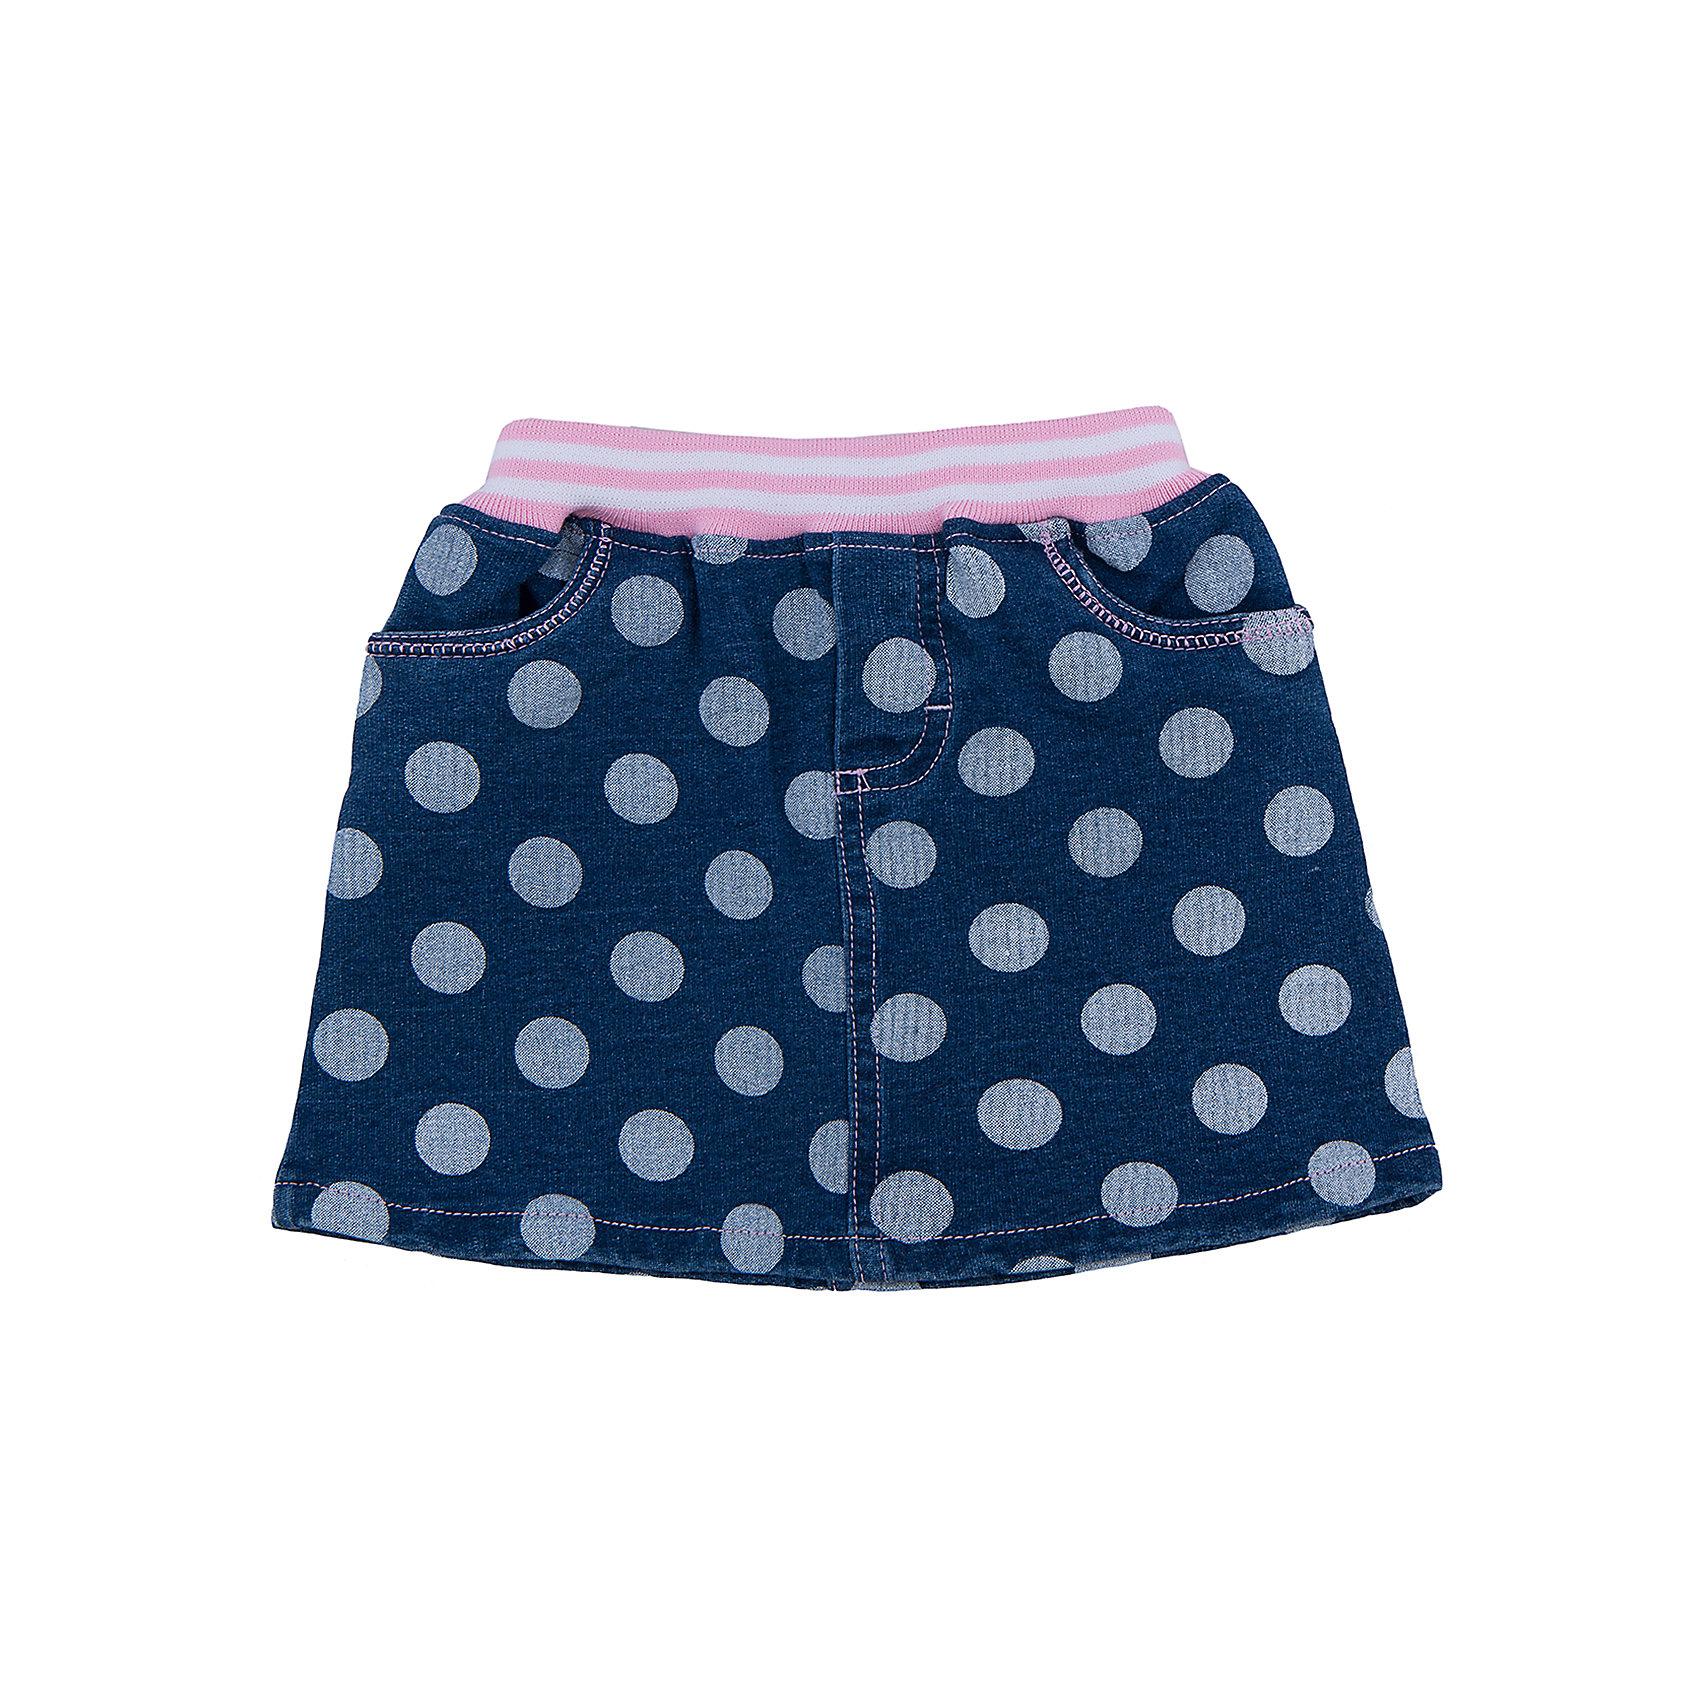 PlayToday Юбка для девочки PlayToday юбка playtoday для девочки